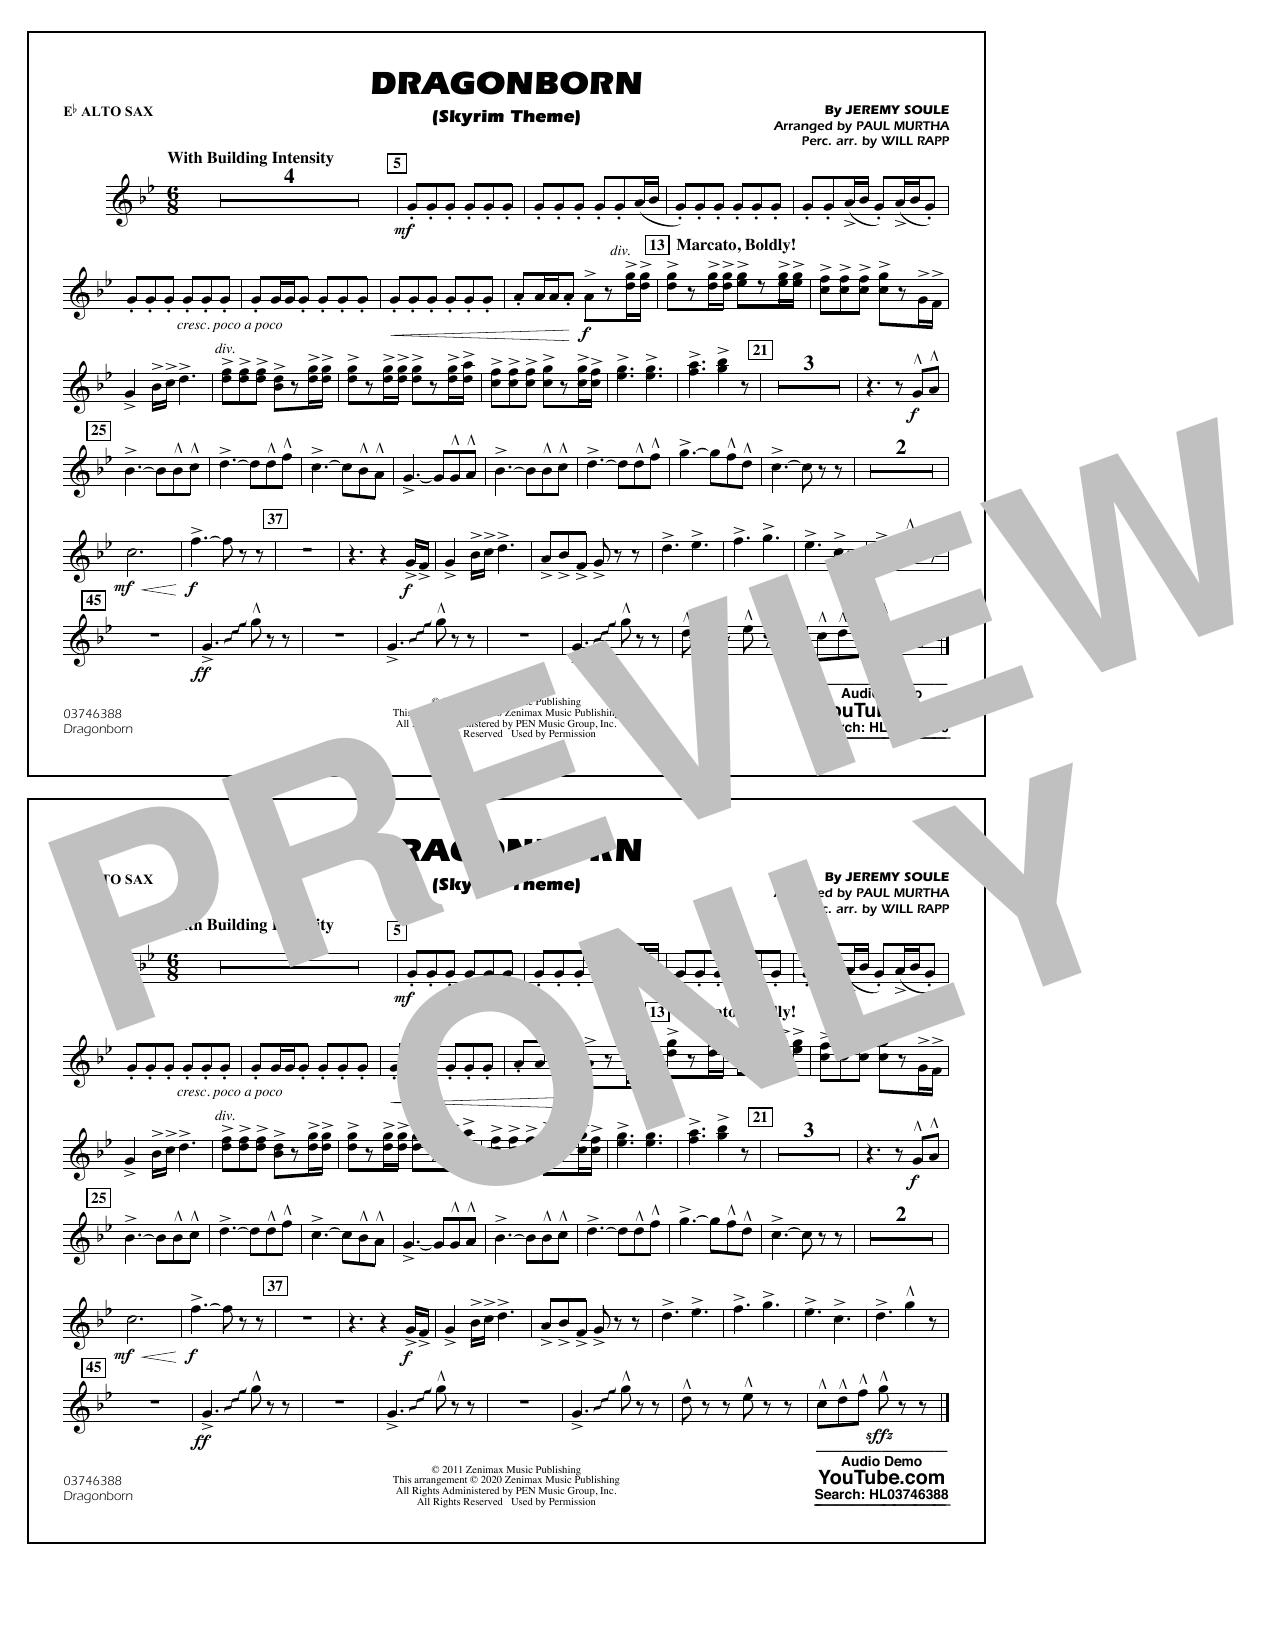 Dragonborn (Skyrim Theme) (arr. Will Rapp & Paul Murtha) - Eb Alto Sax Sheet Music